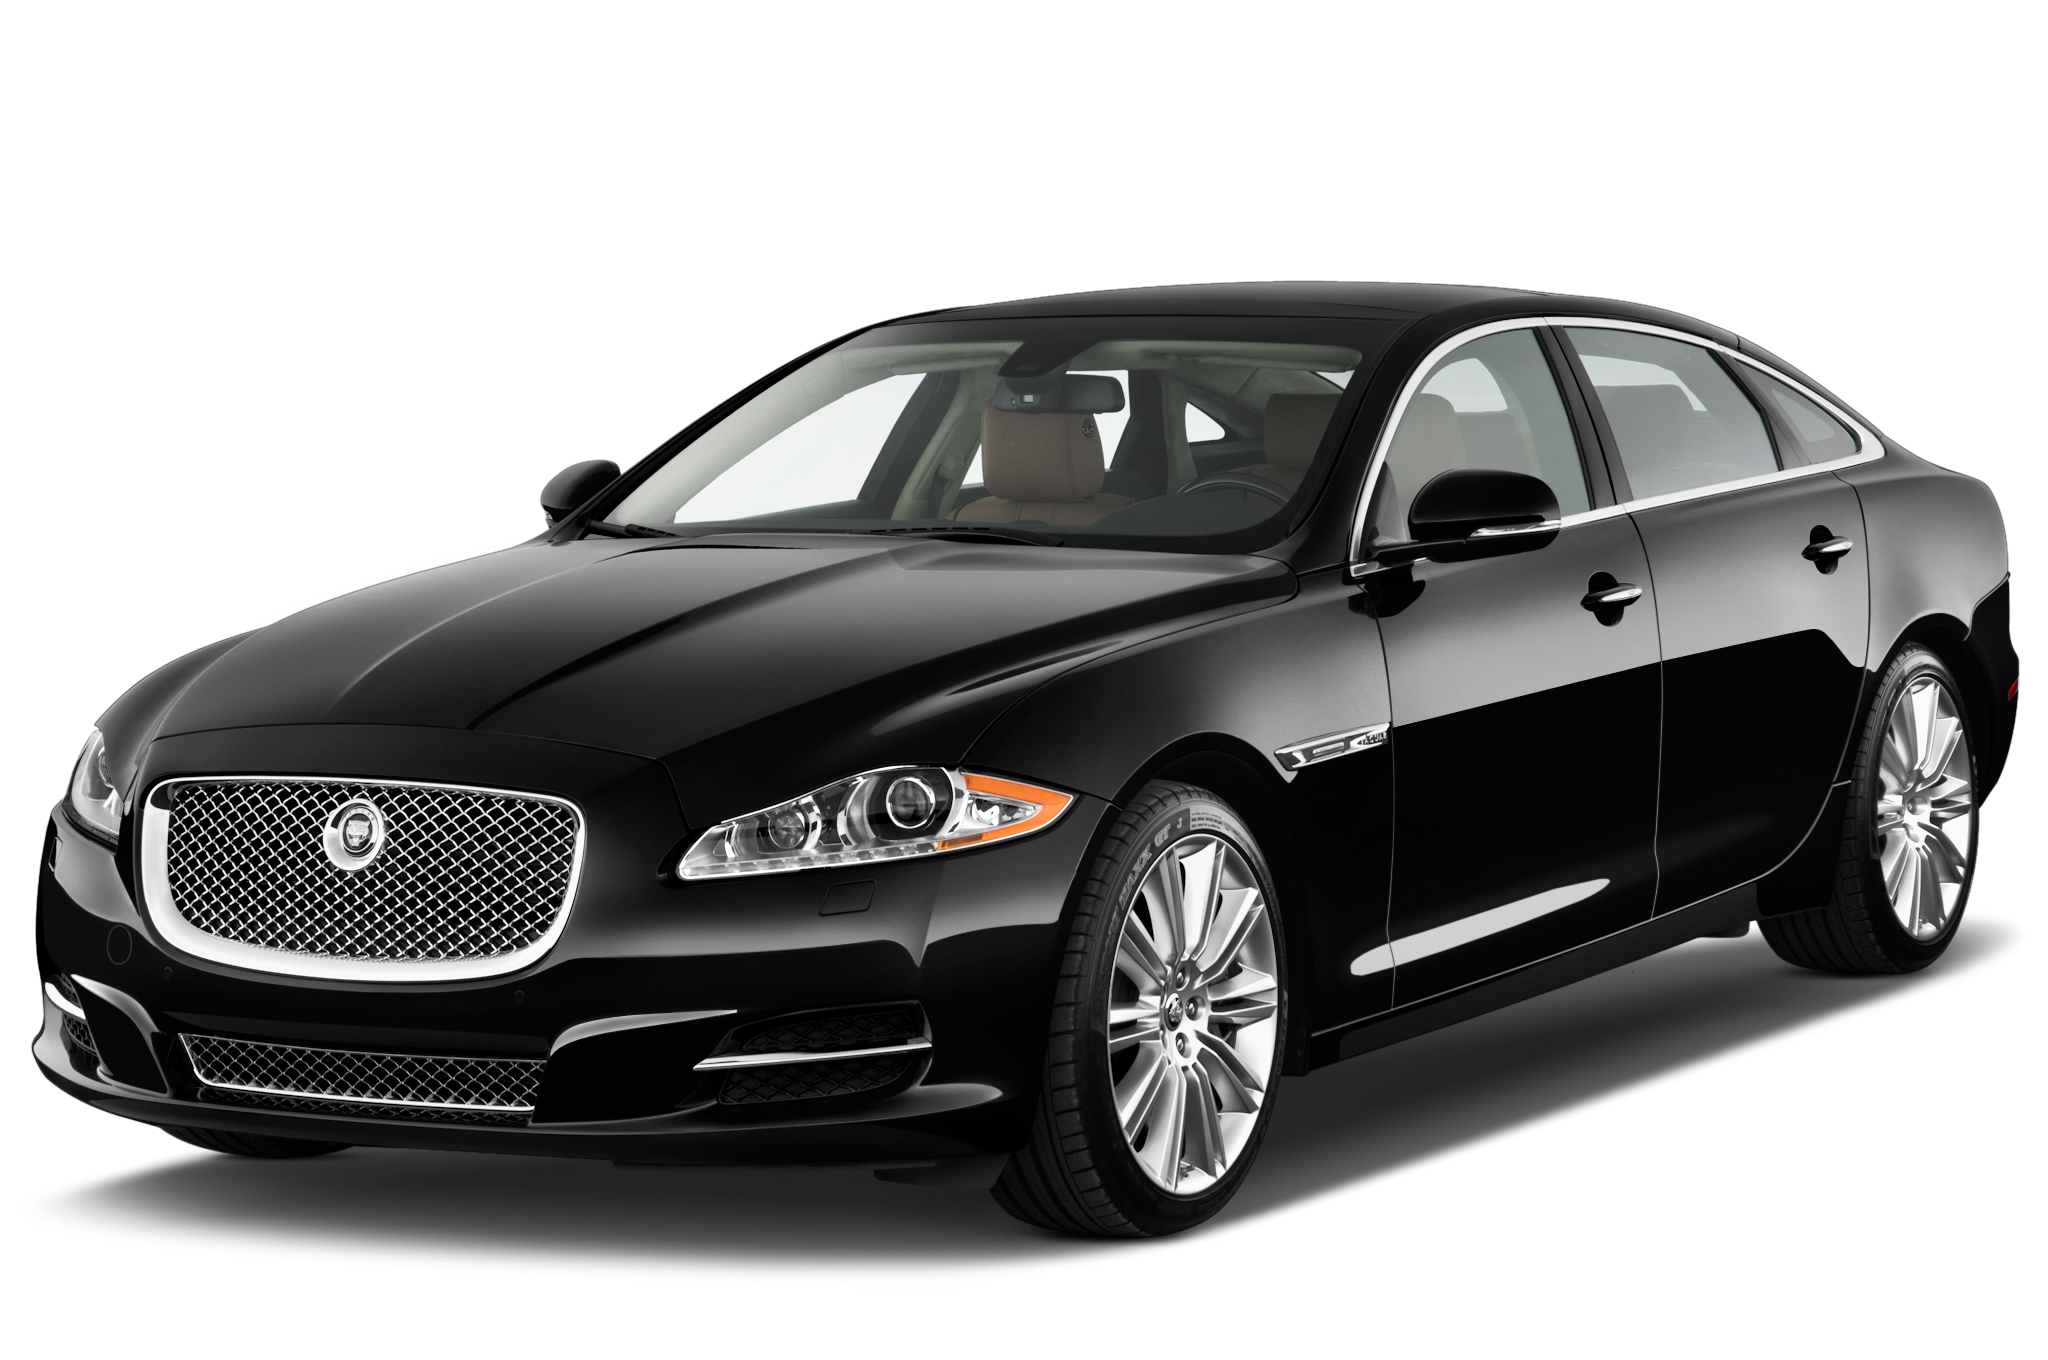 2015 Jaguar XJ-Series